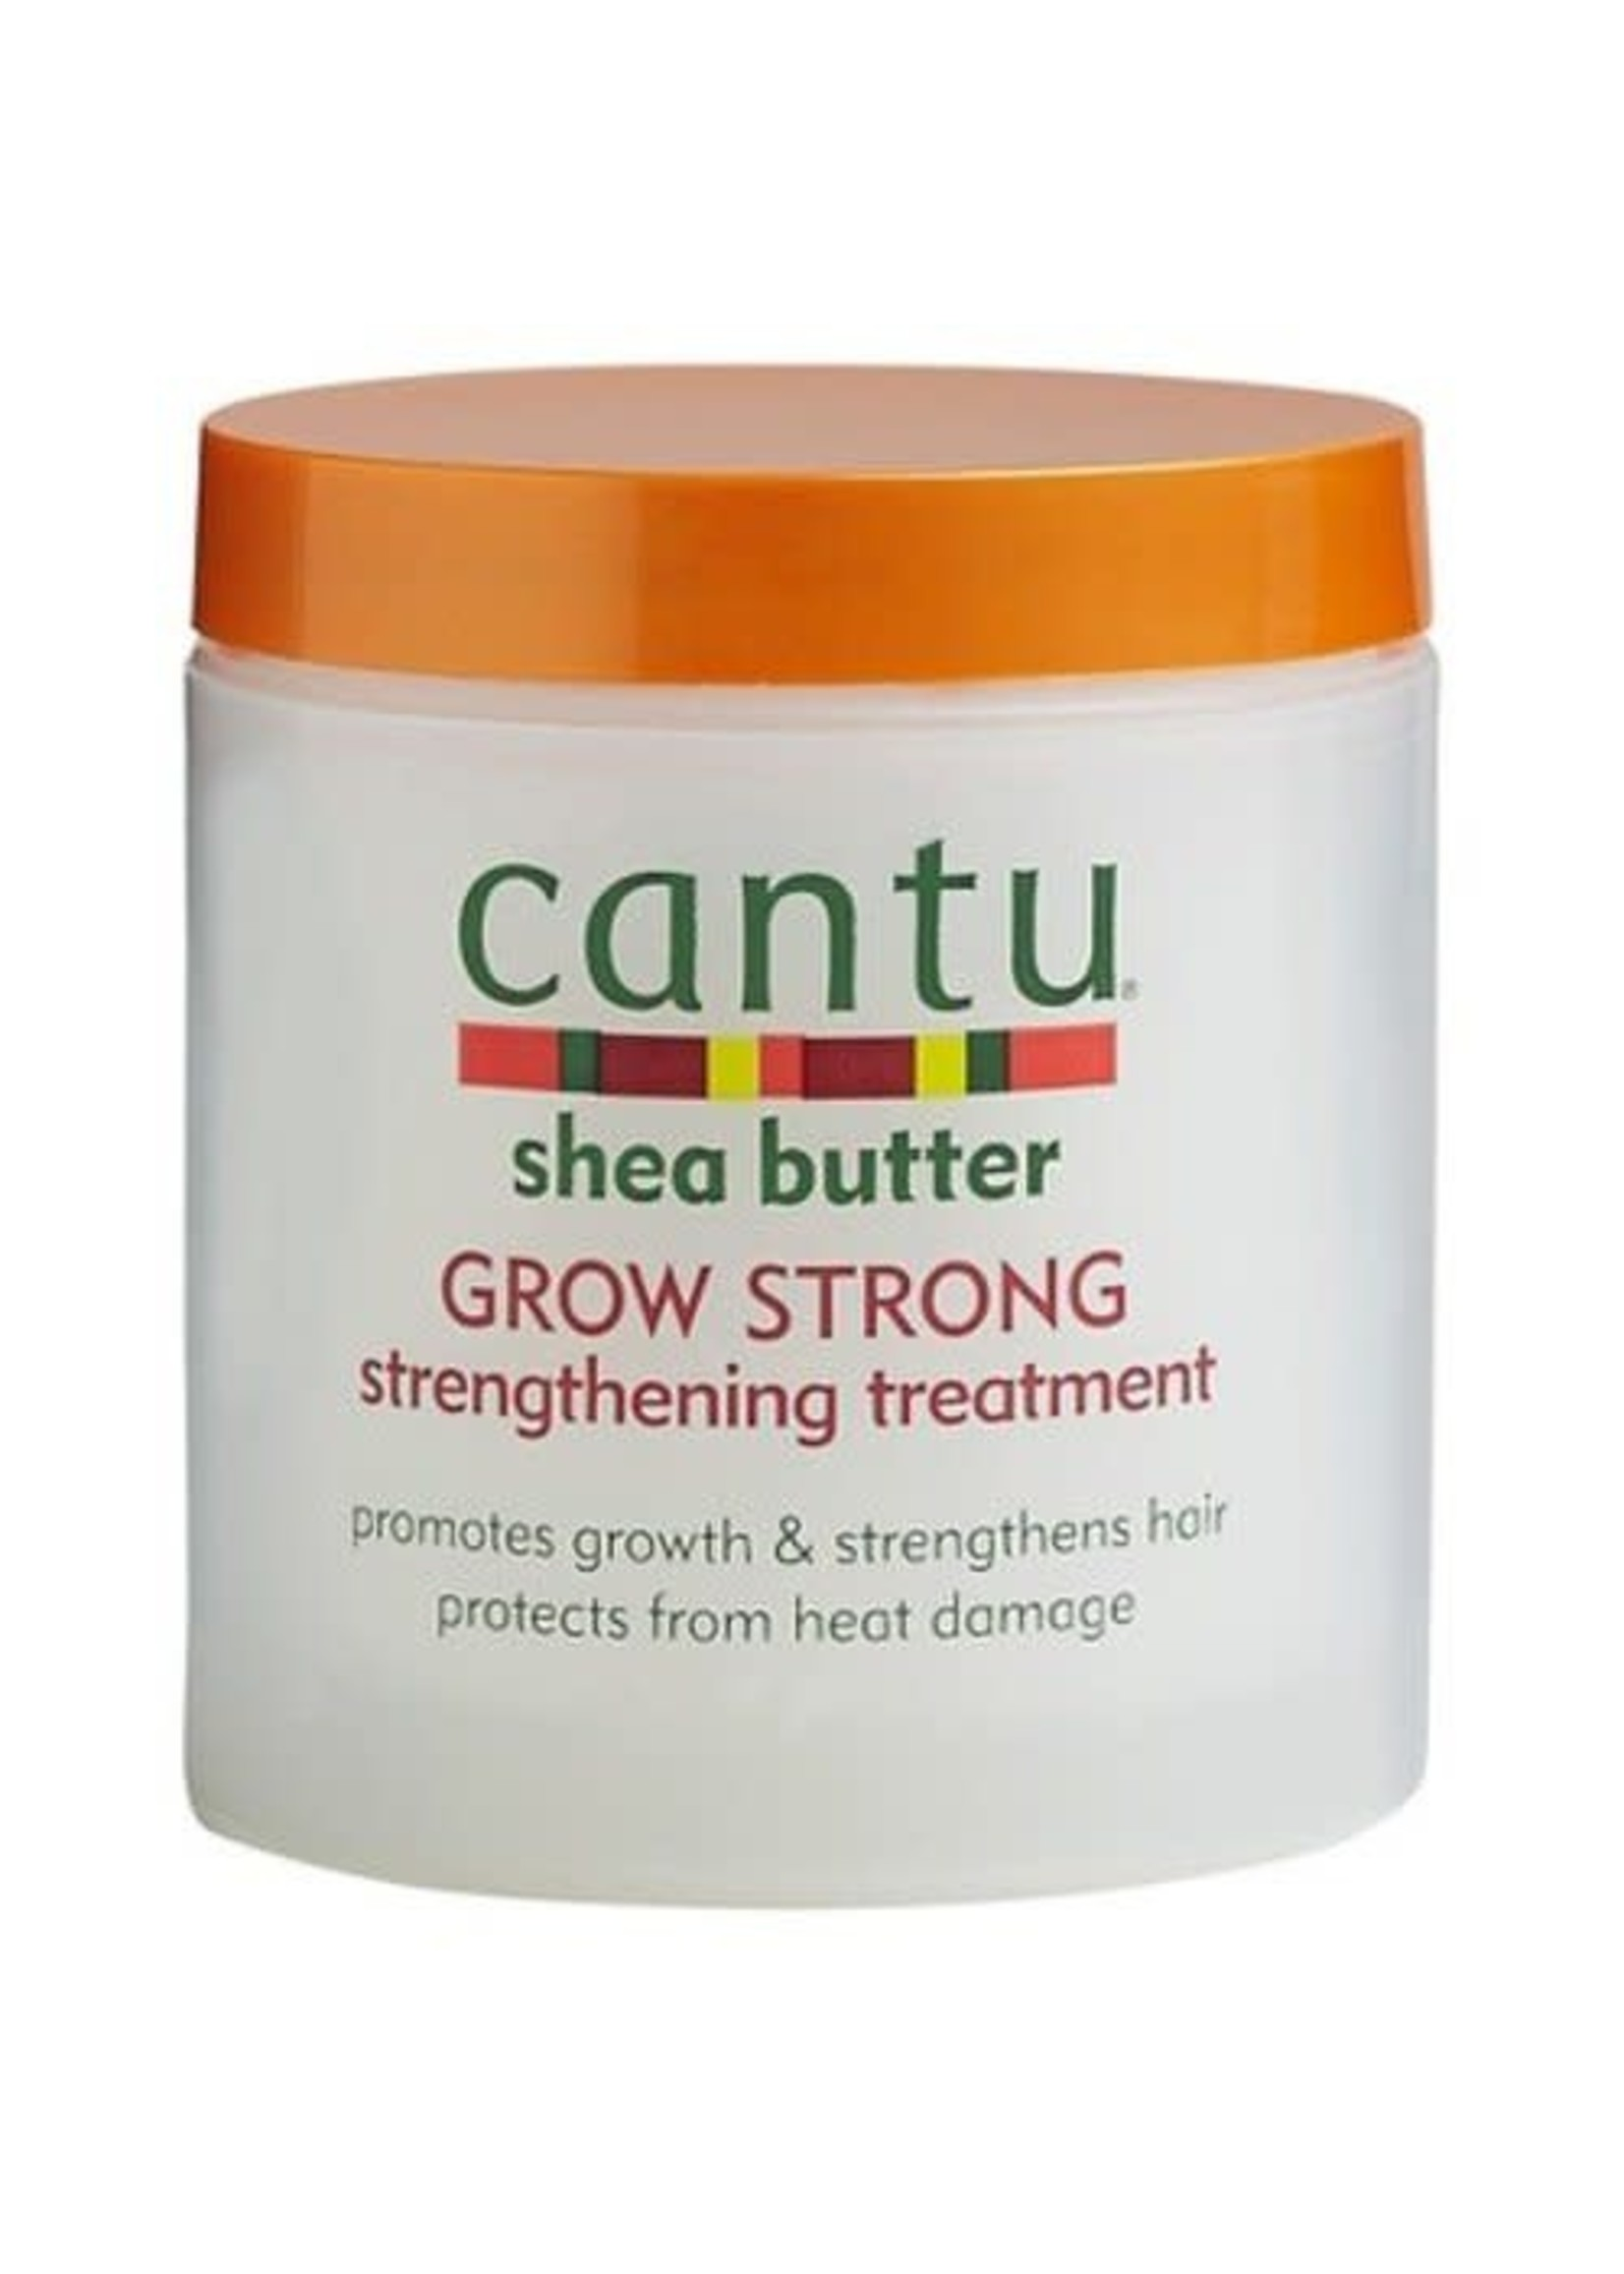 Cantu SB Grow Strong Strength Treatment 6oz